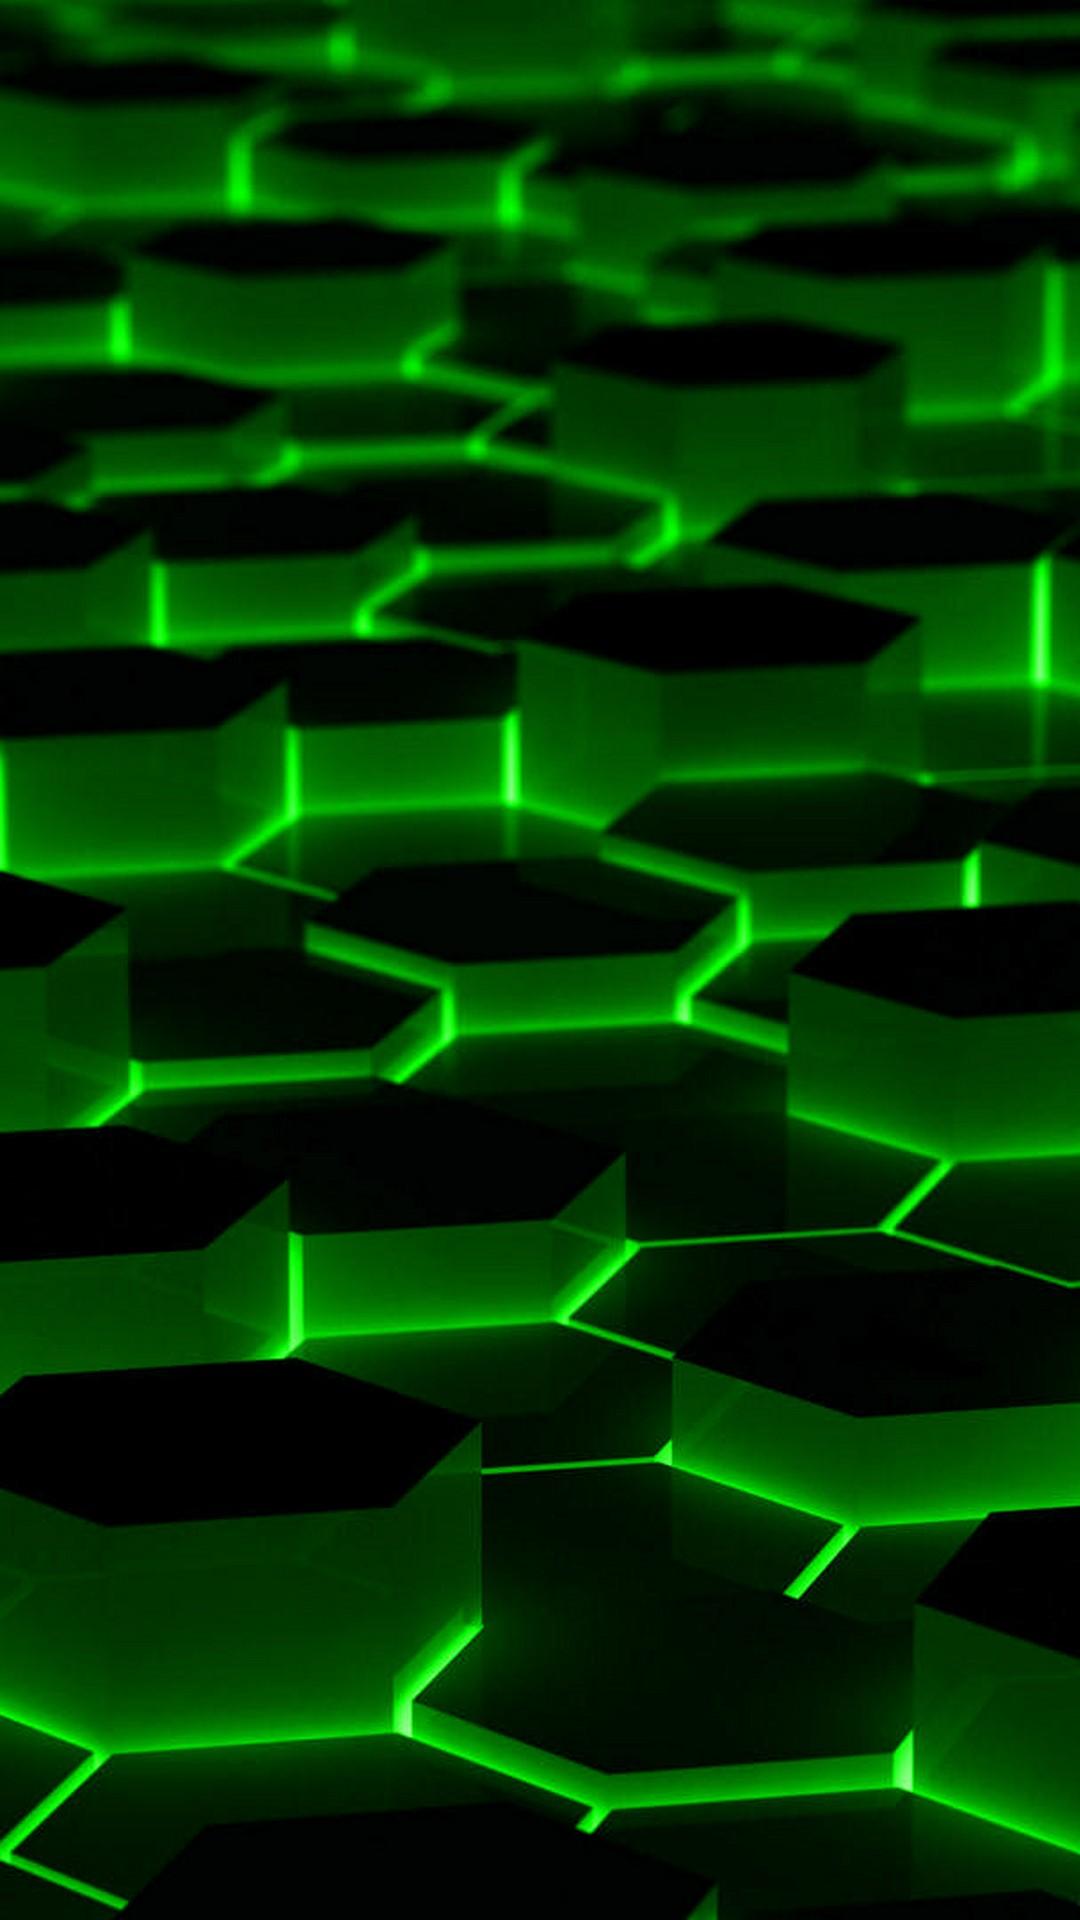 Iphone X Wallpaper Neon Green With Image Resolution - Hd Neon Light Green - HD Wallpaper